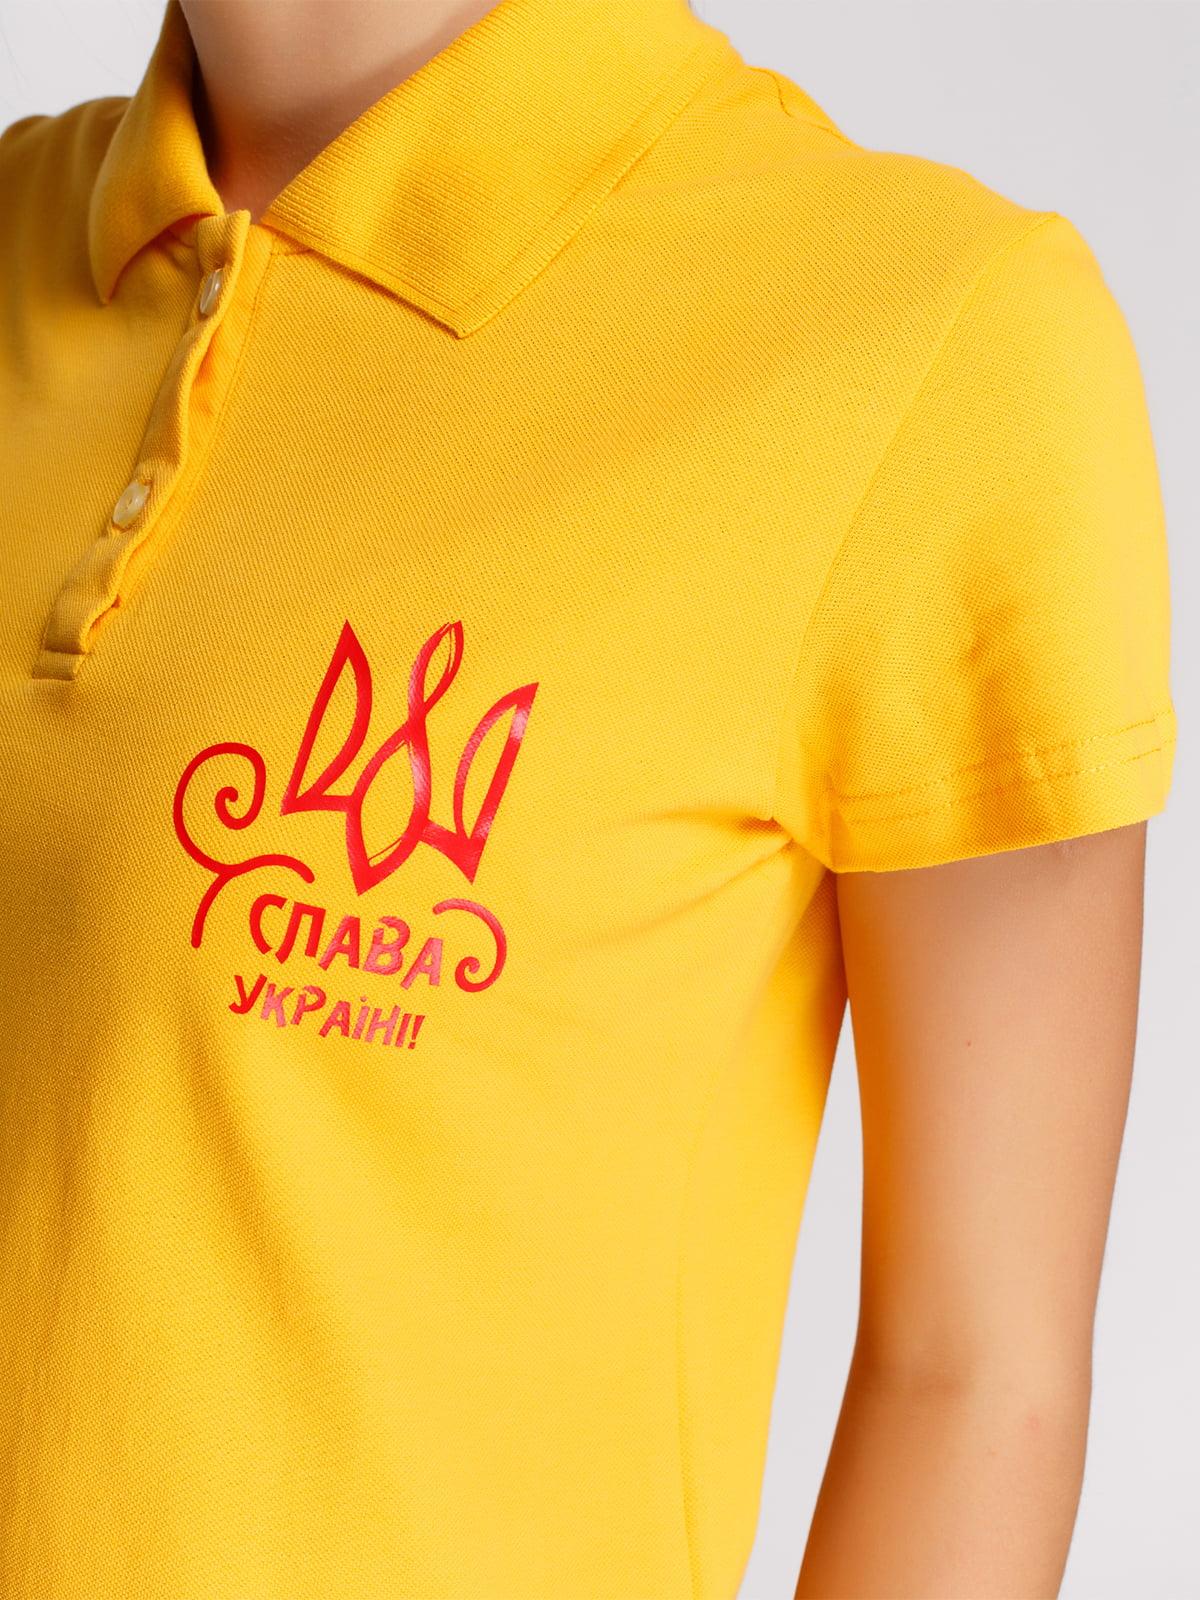 Футболка-поло жовта з принтом | 4578491 | фото 3